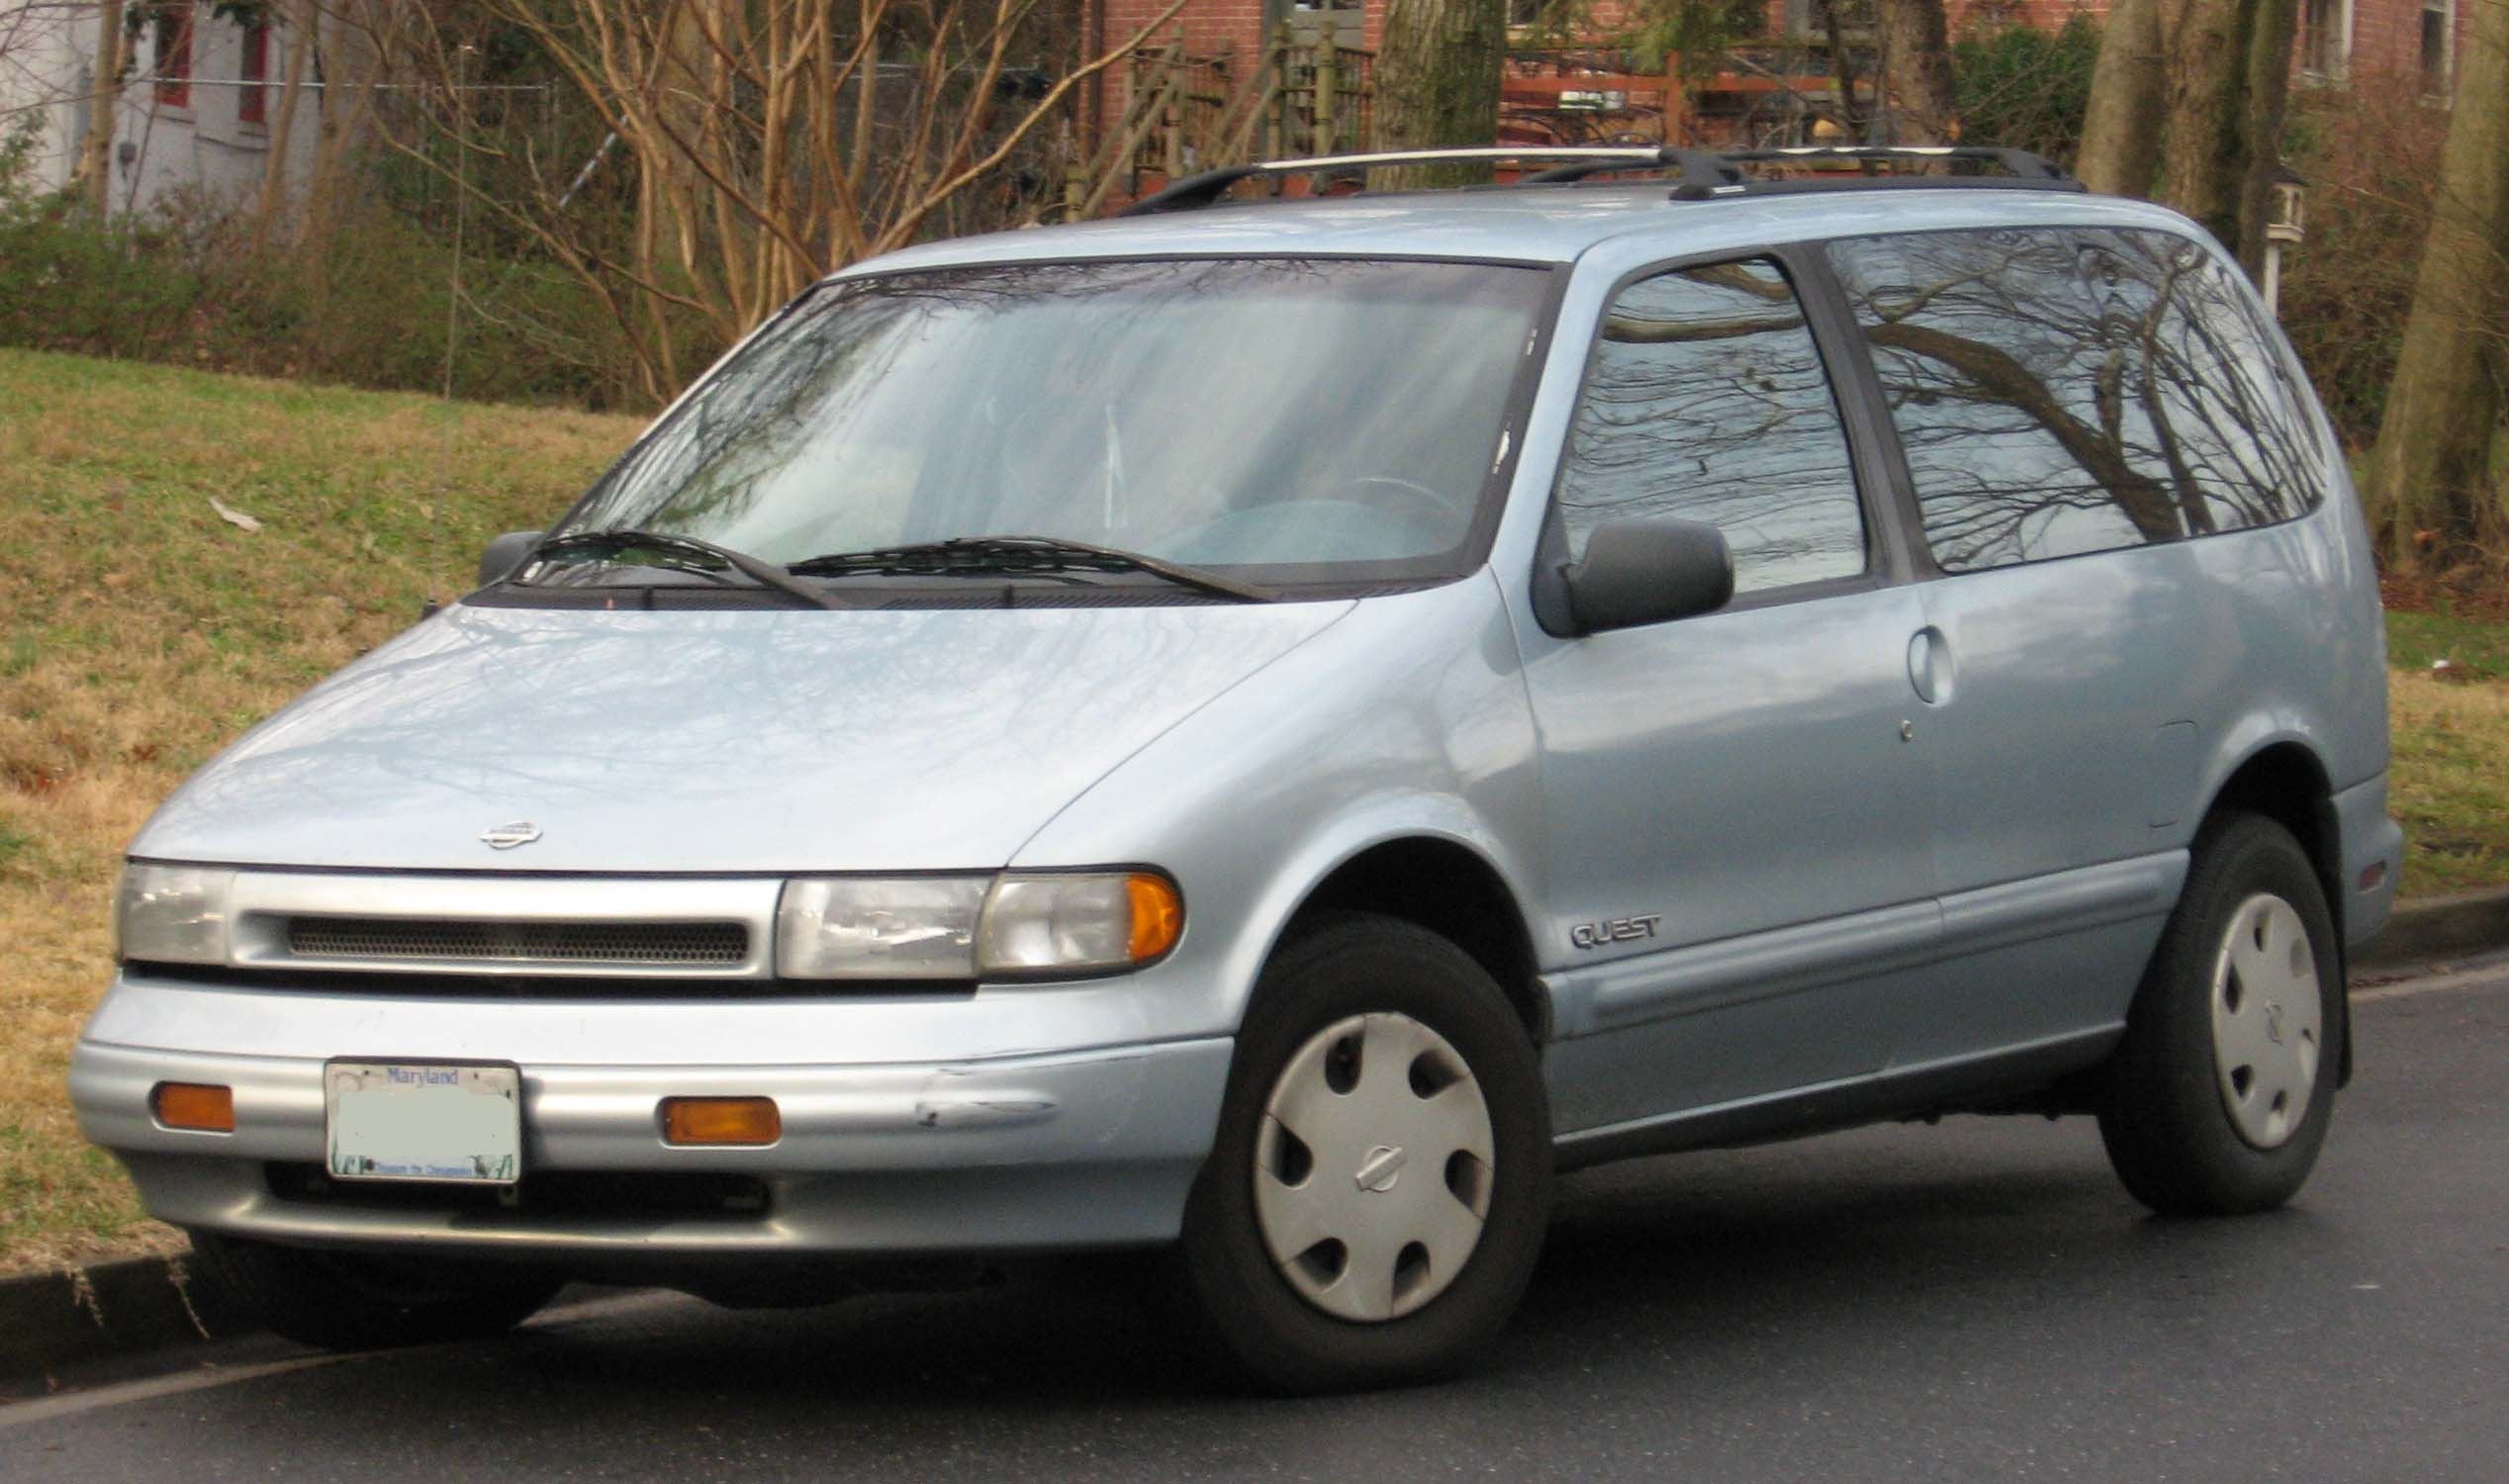 1996 Nissan Quest 1998 Timing Belt Image 2536x1500